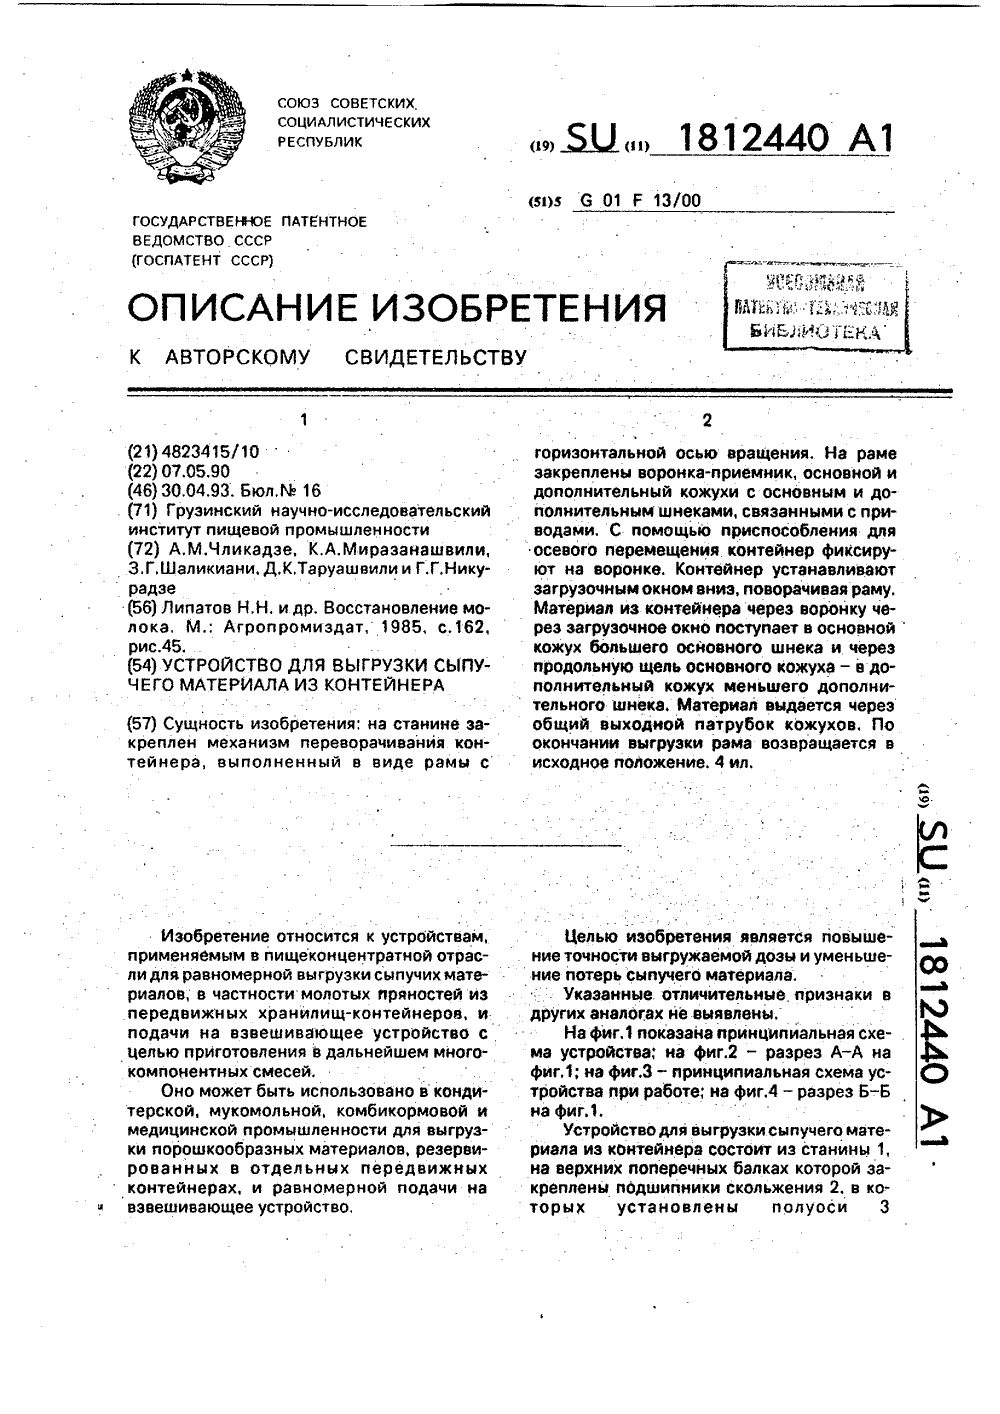 1,1-дихлор-2,2-бис(4-хлорфенил)этилен